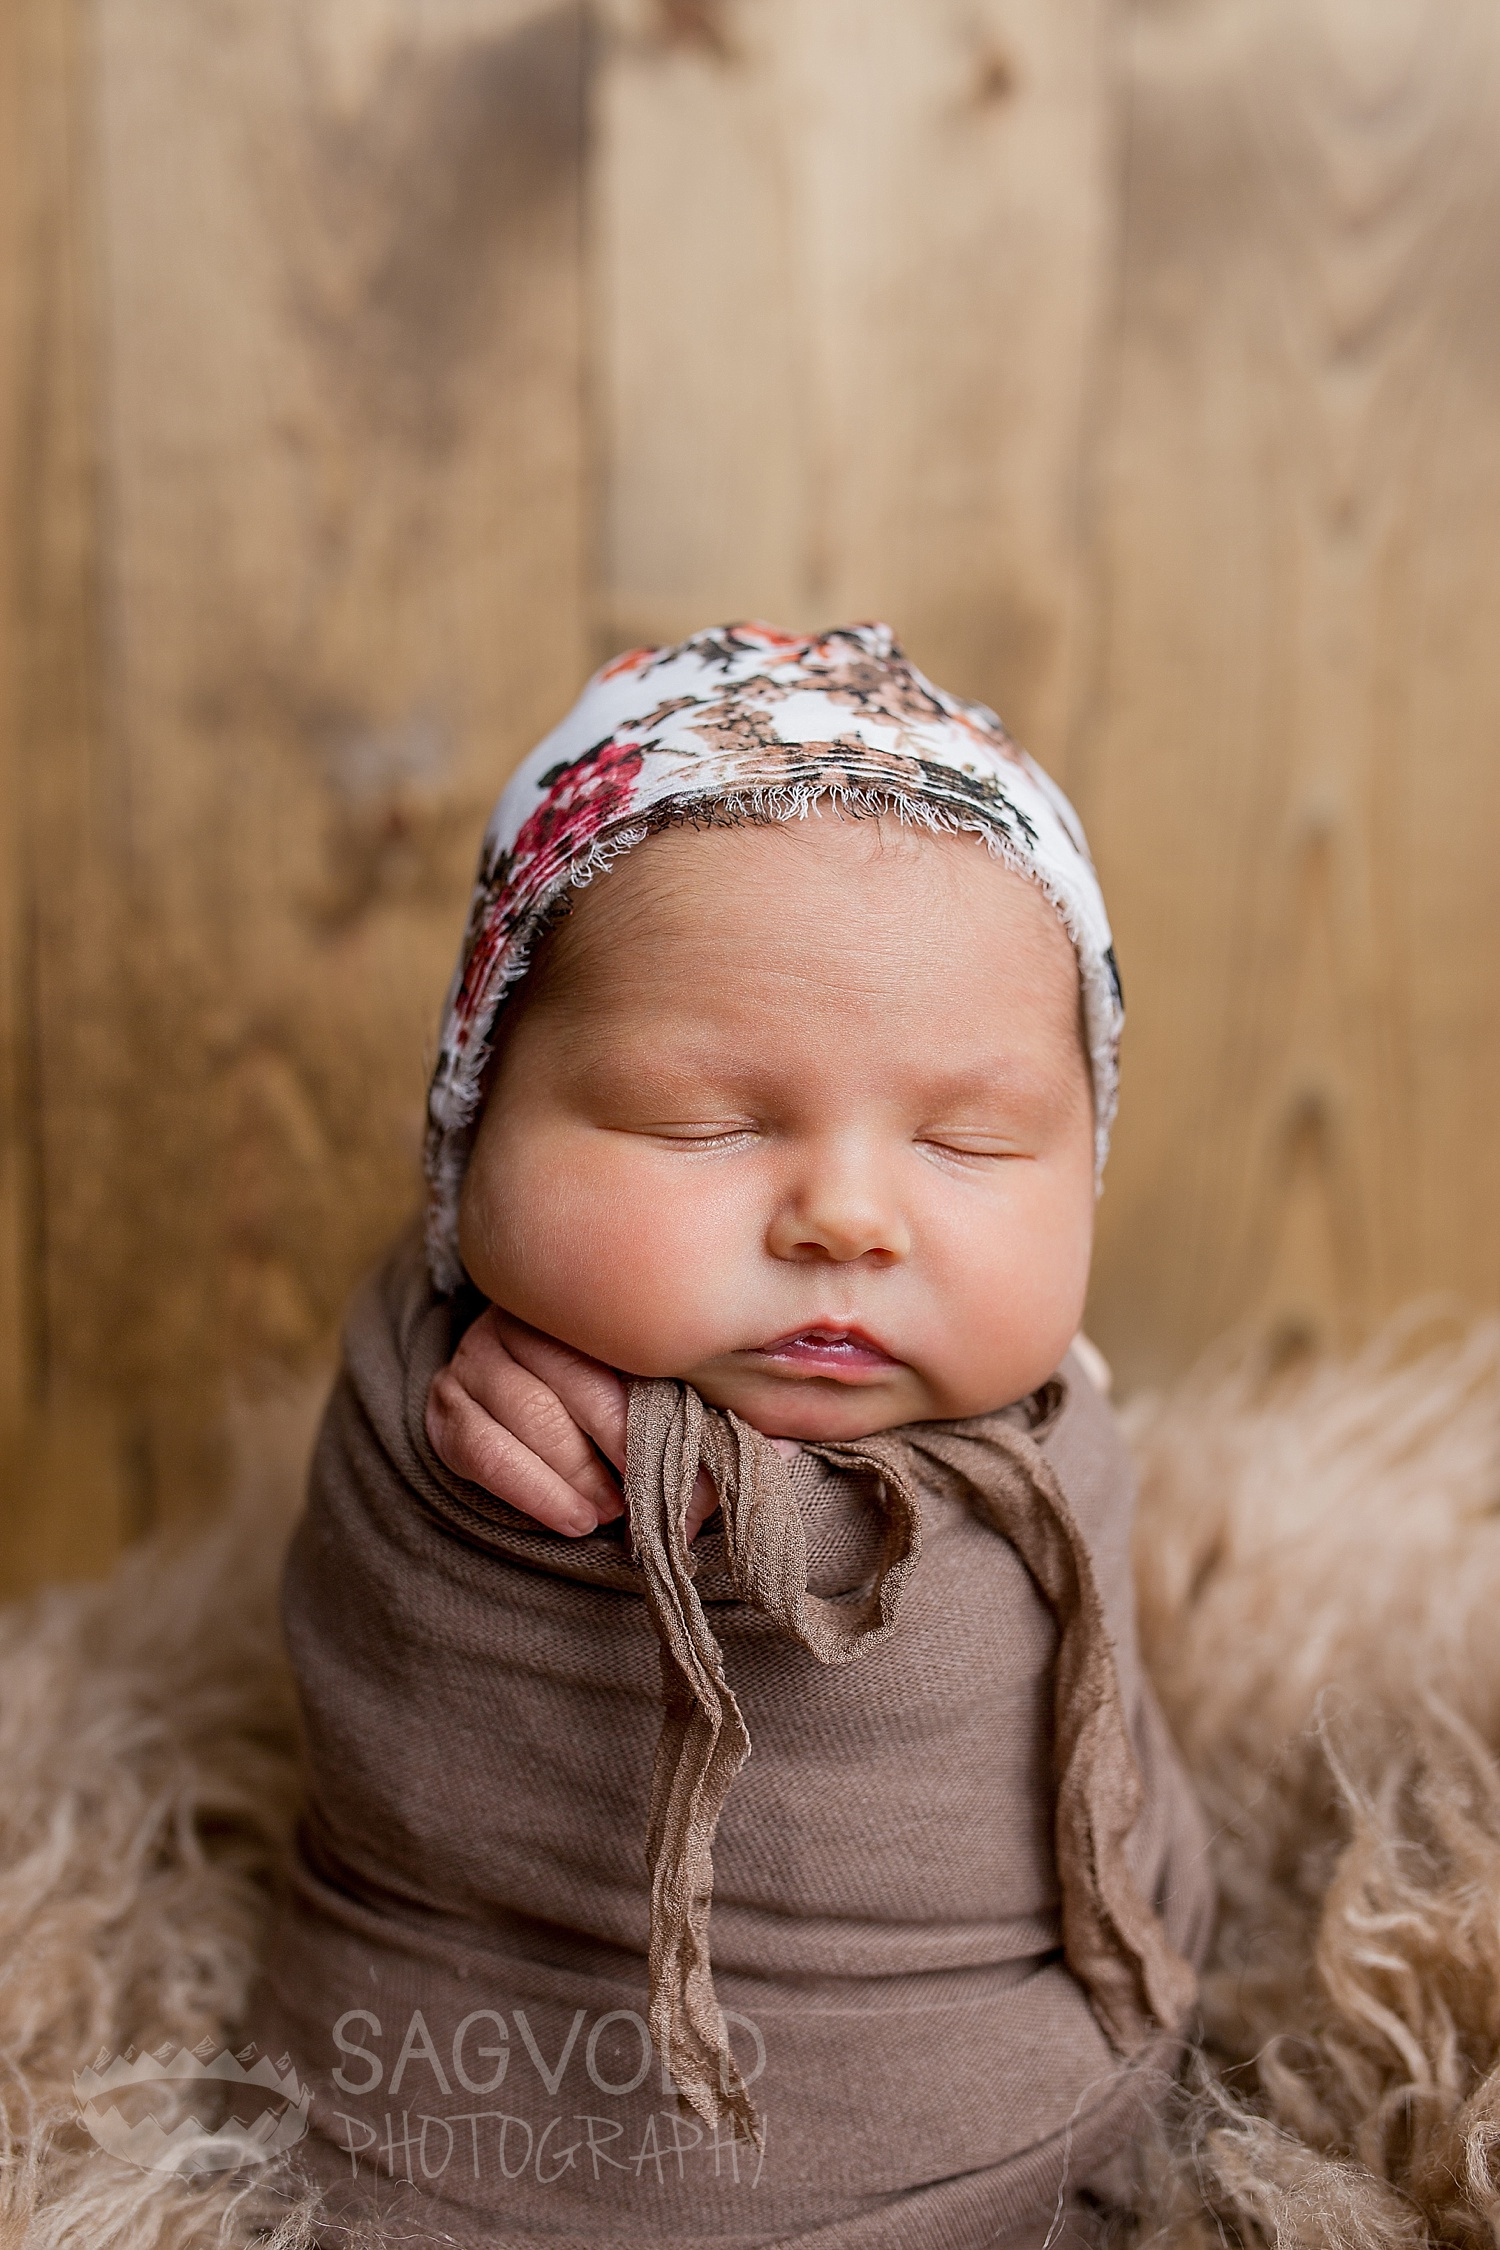 Newborn potato sack pose Fargo ND newborn photographer Janna Sagvold Photography